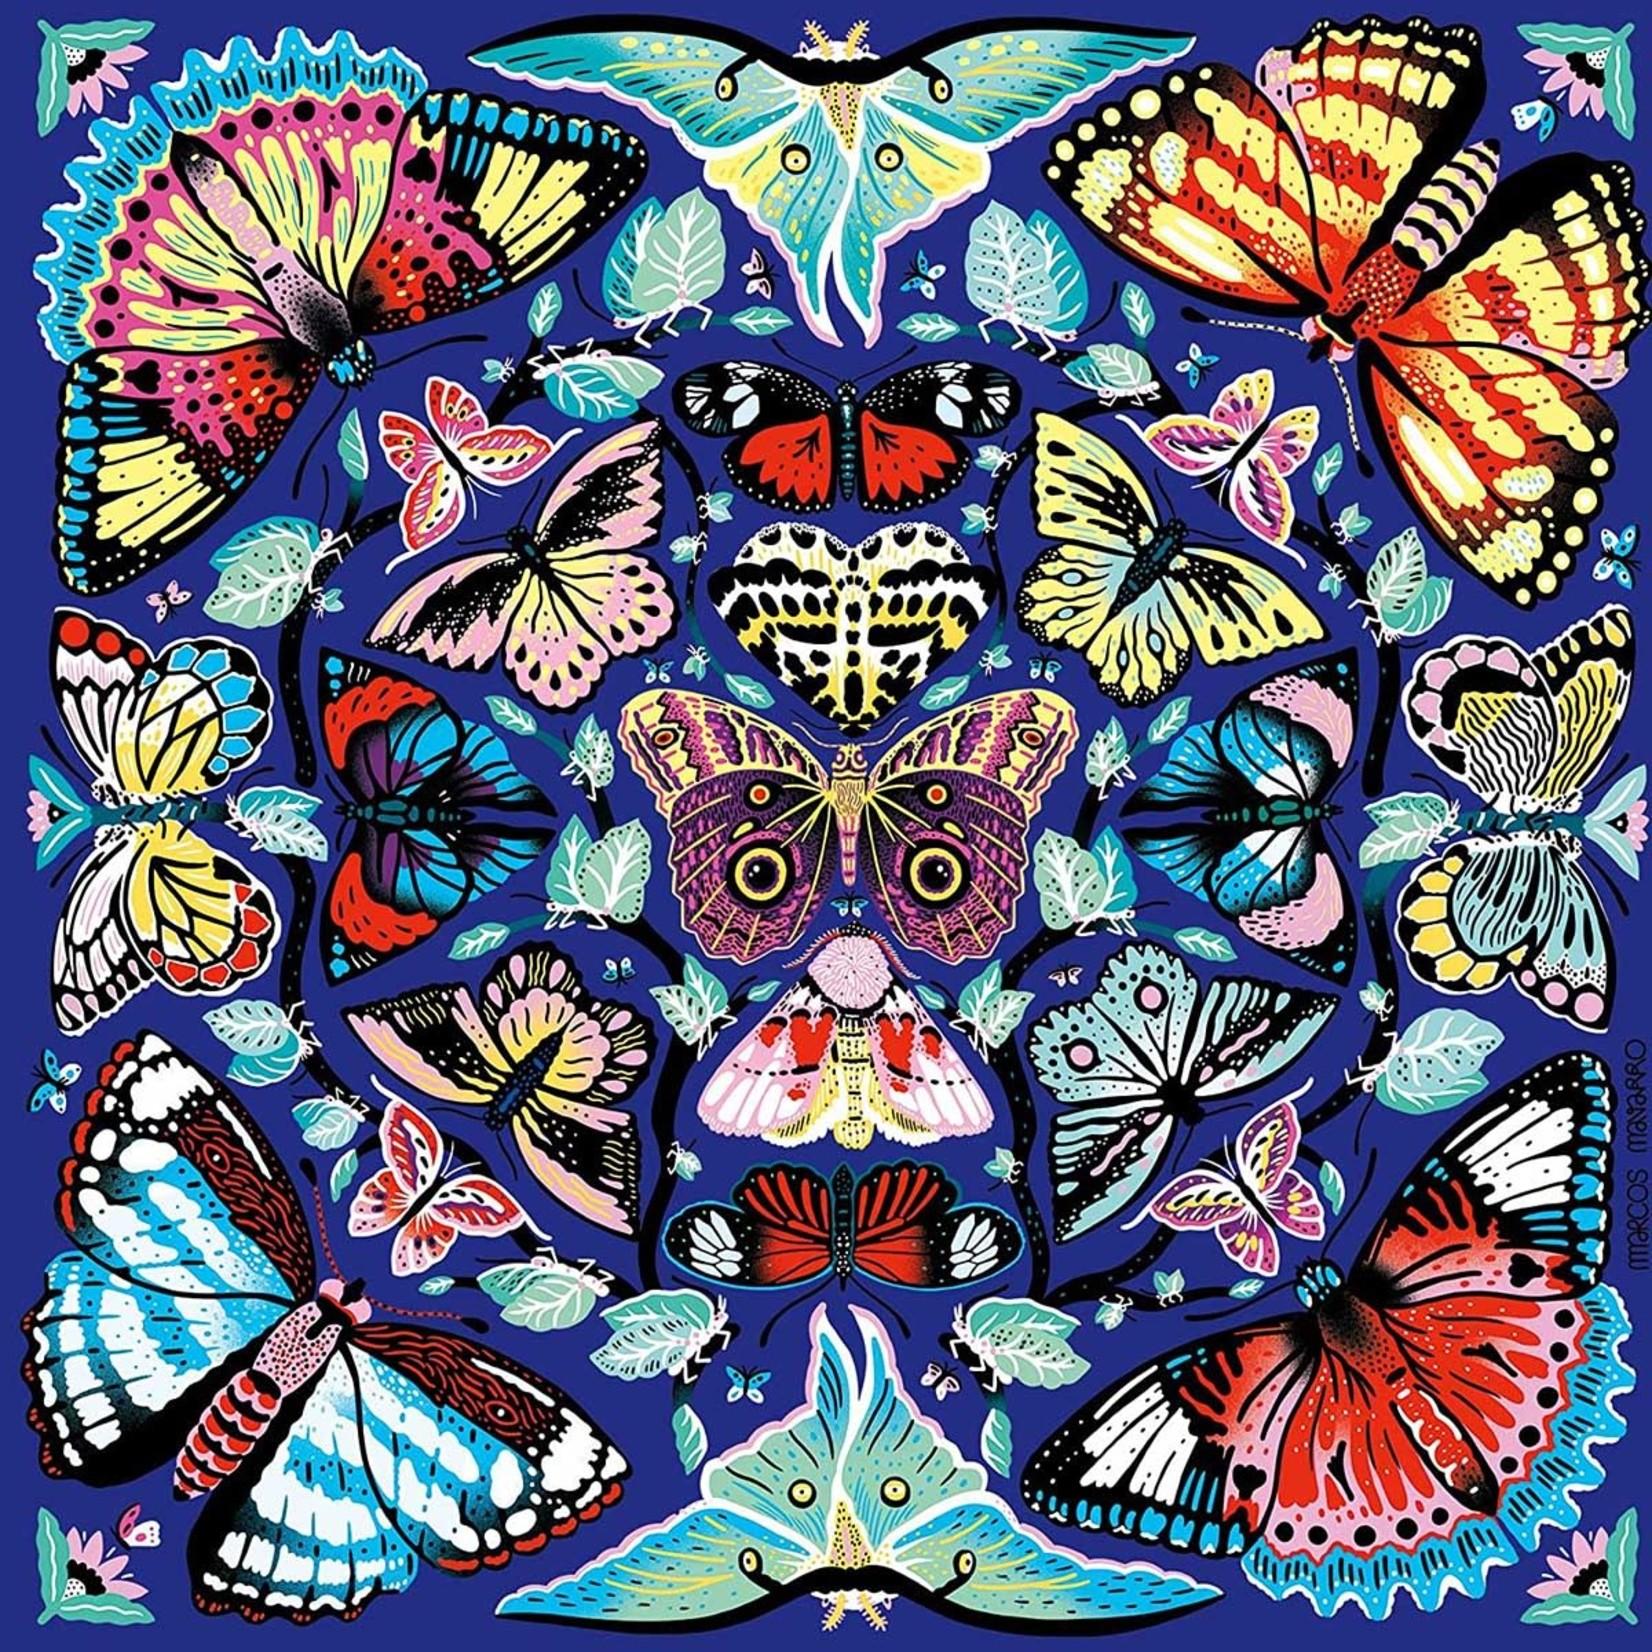 Chronicle Books Mudpuppy Puzzle: Kaleido Butterflies 500 pc